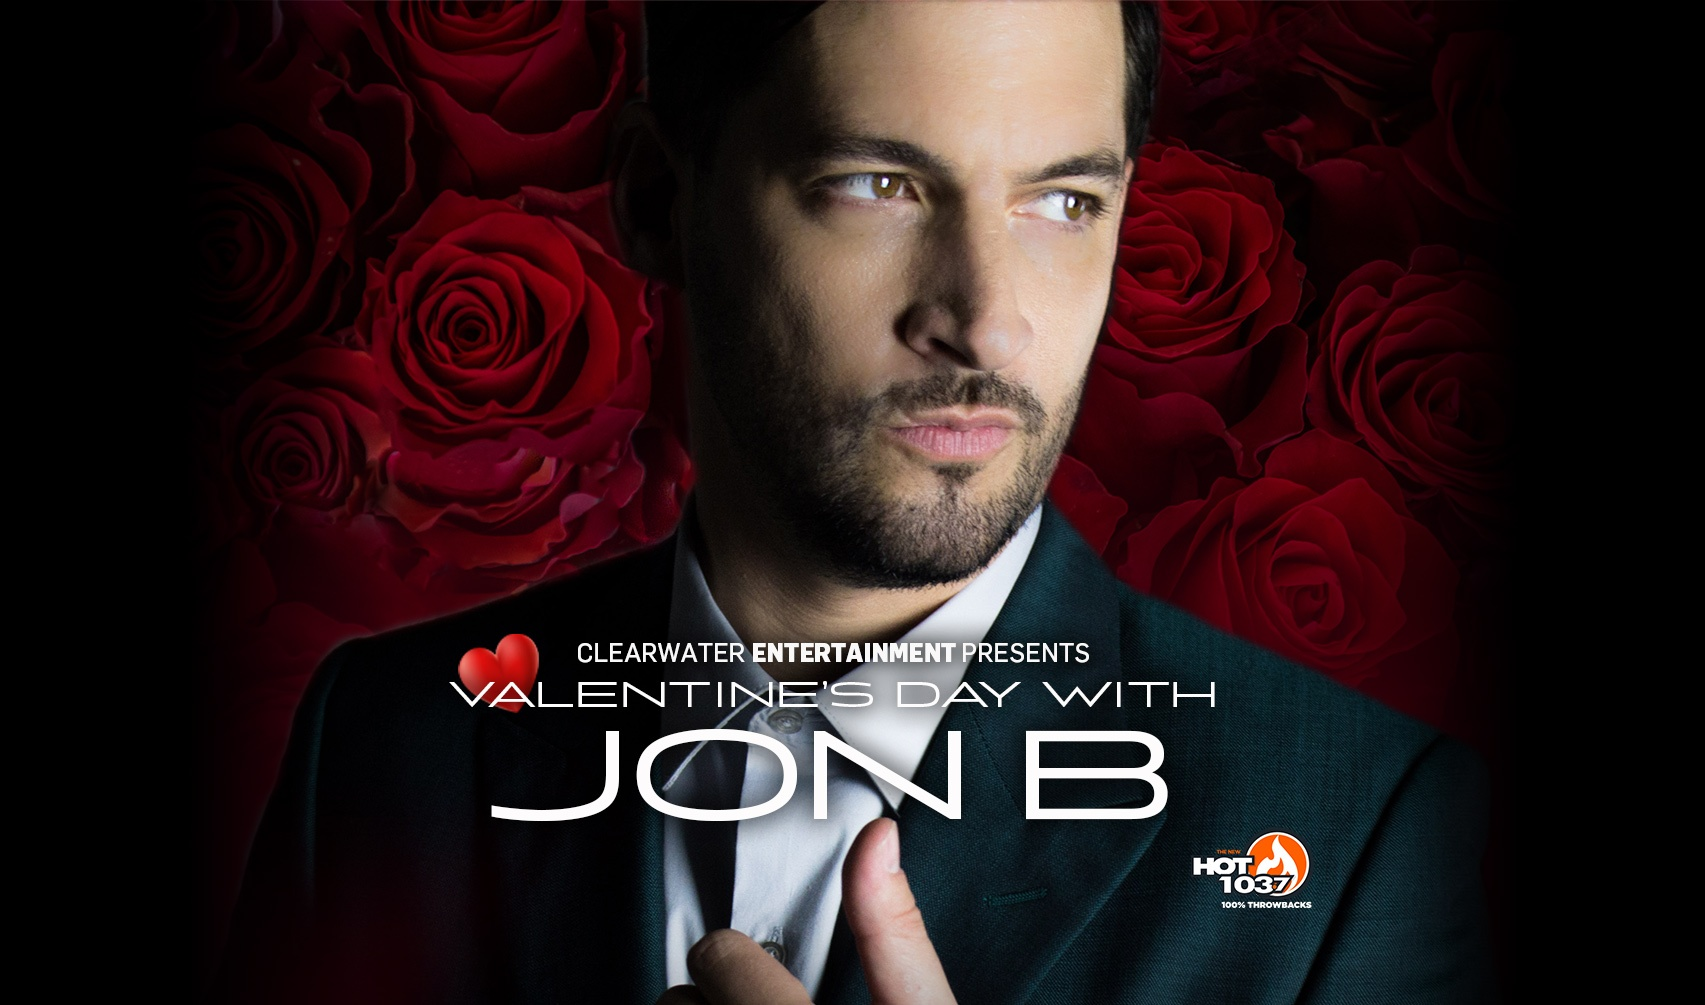 Valentine's Day with Jon B